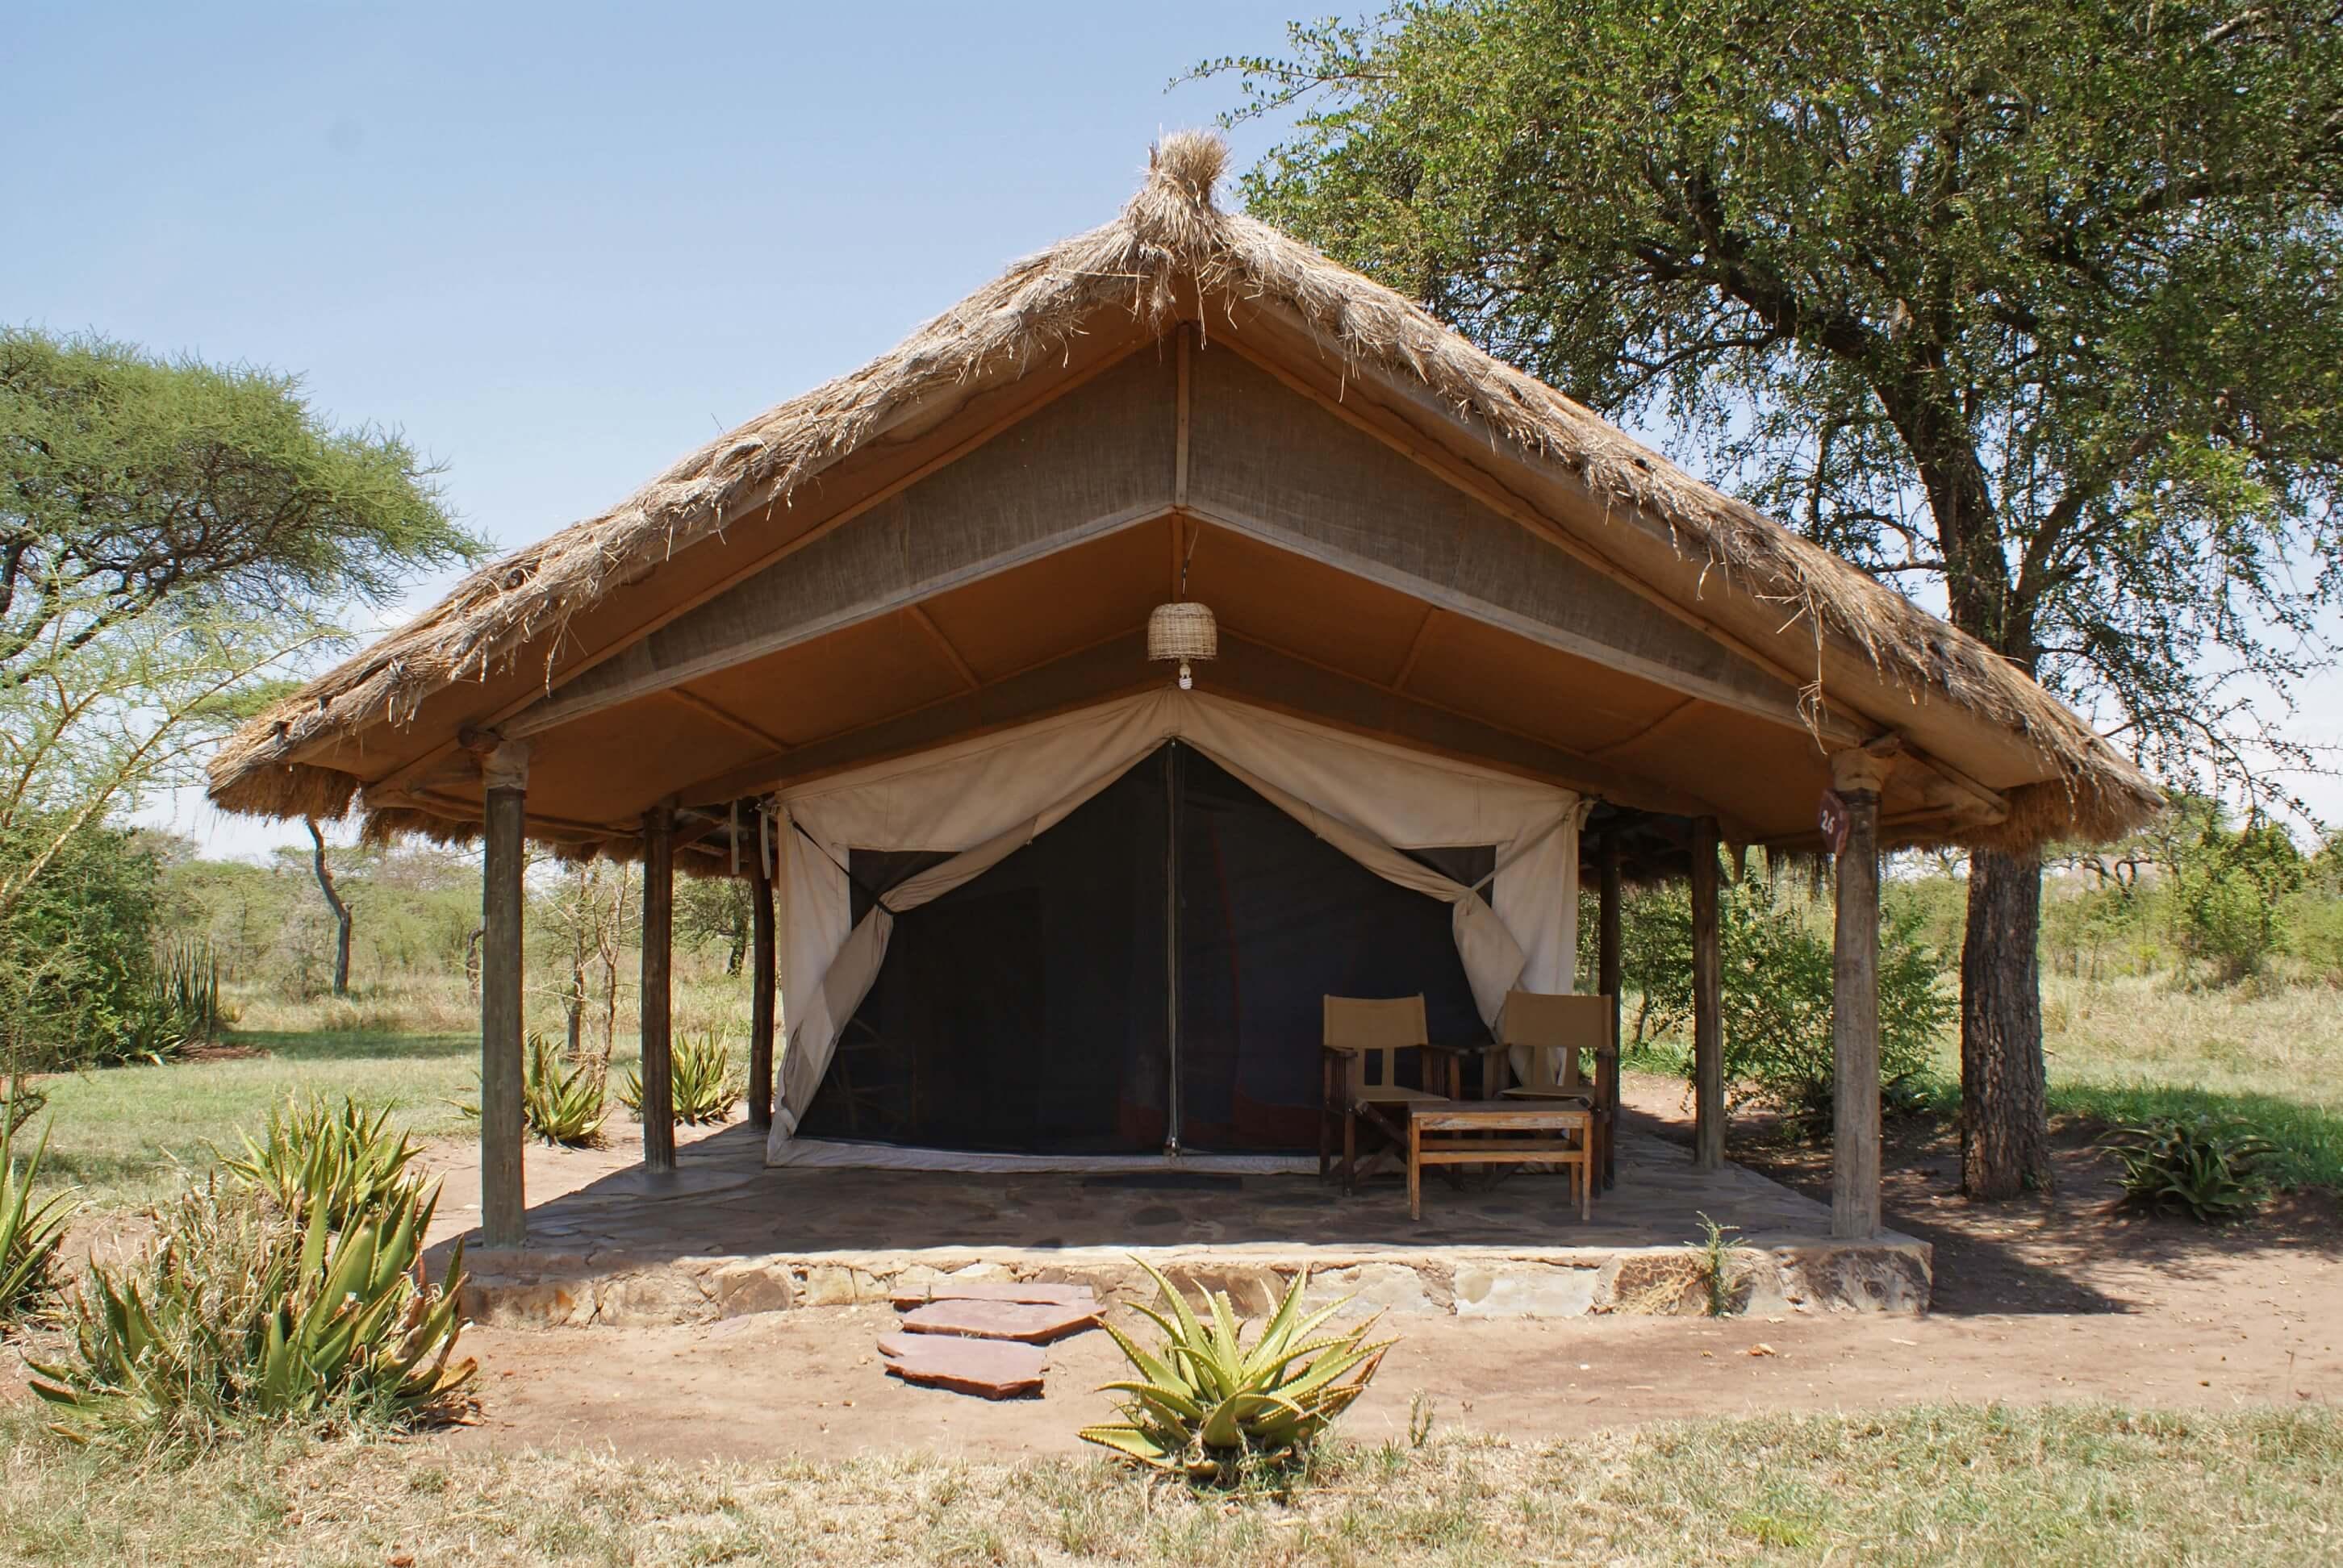 Ikoma Tented Camp